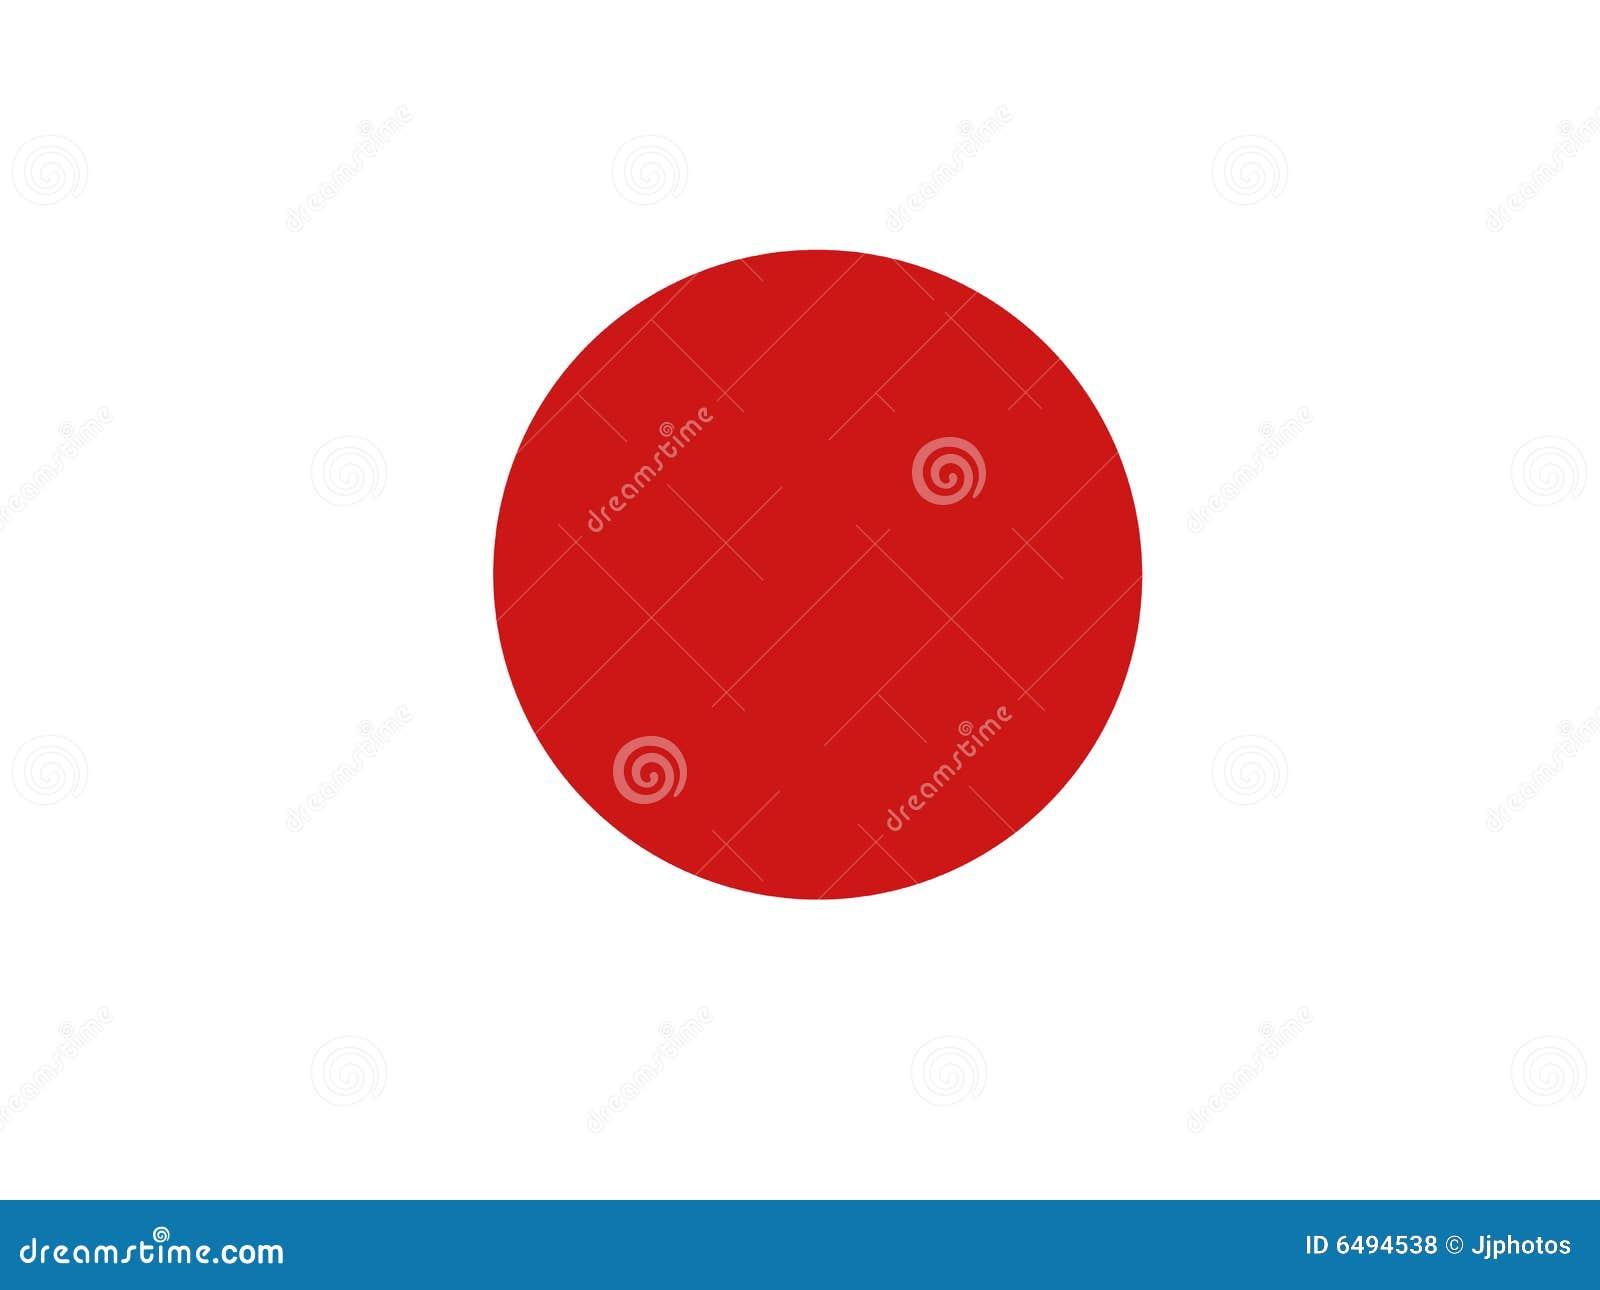 japan flag royalty free stock photos image 6494538